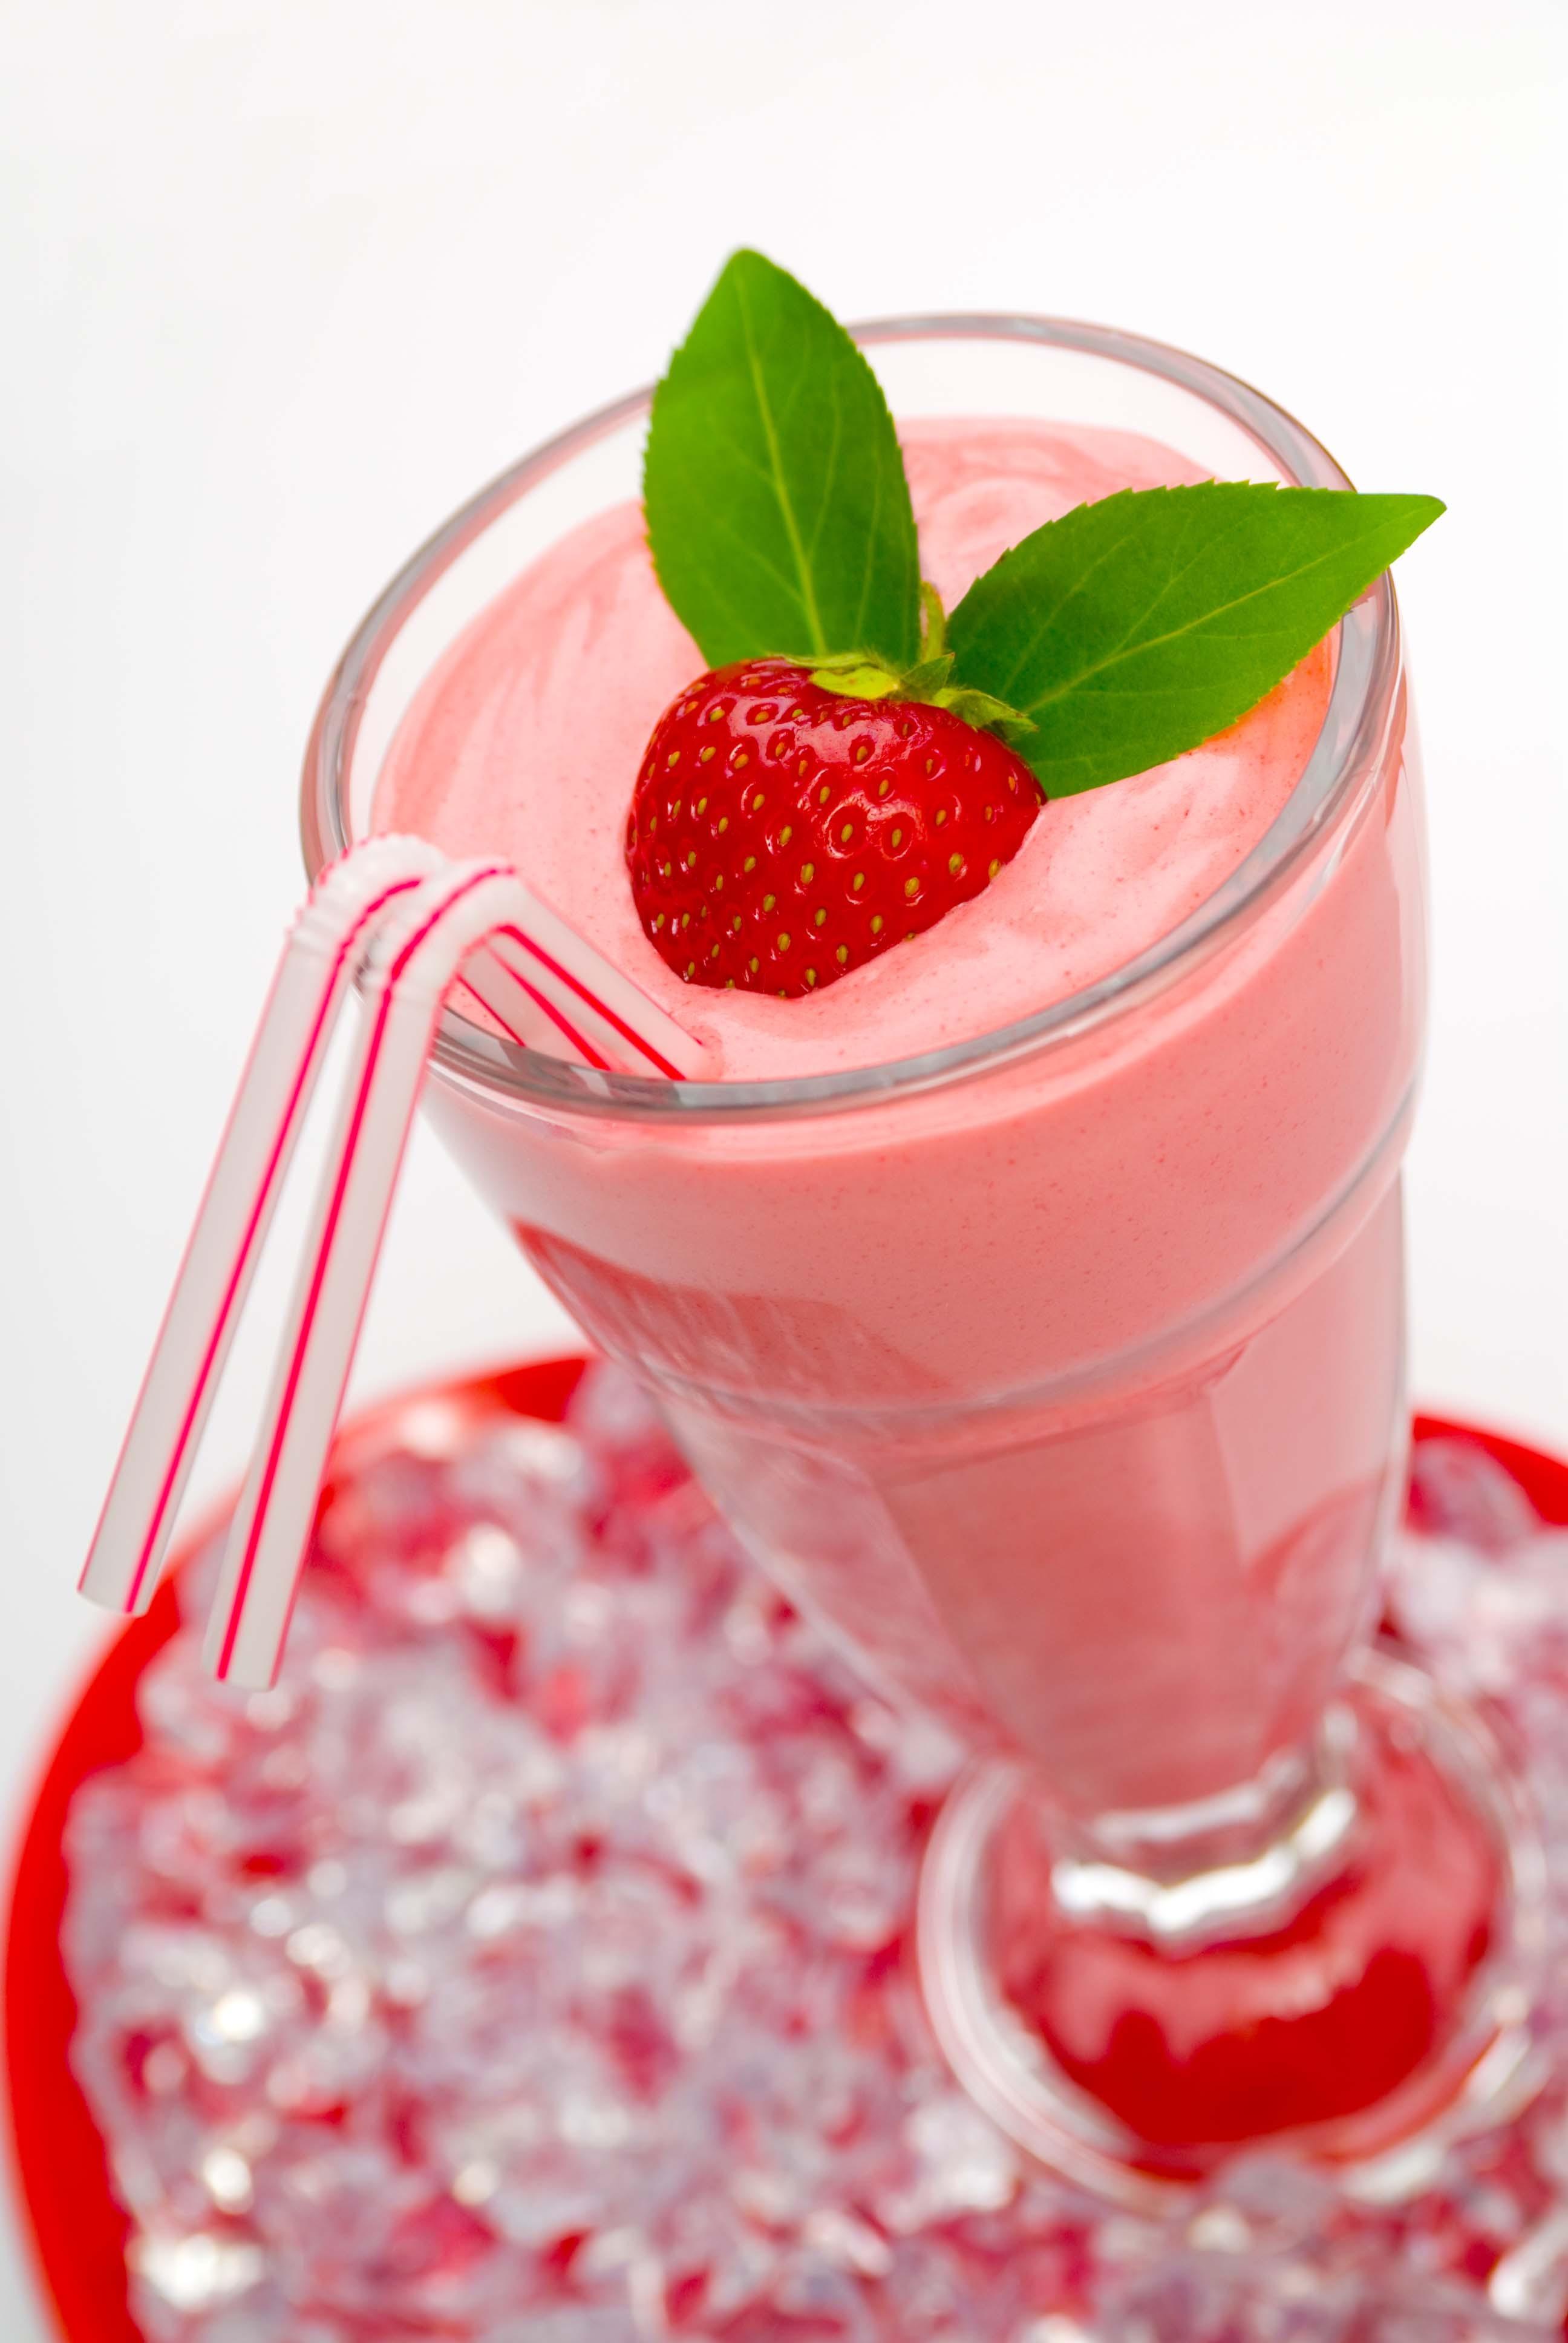 Strawberry Smoothie